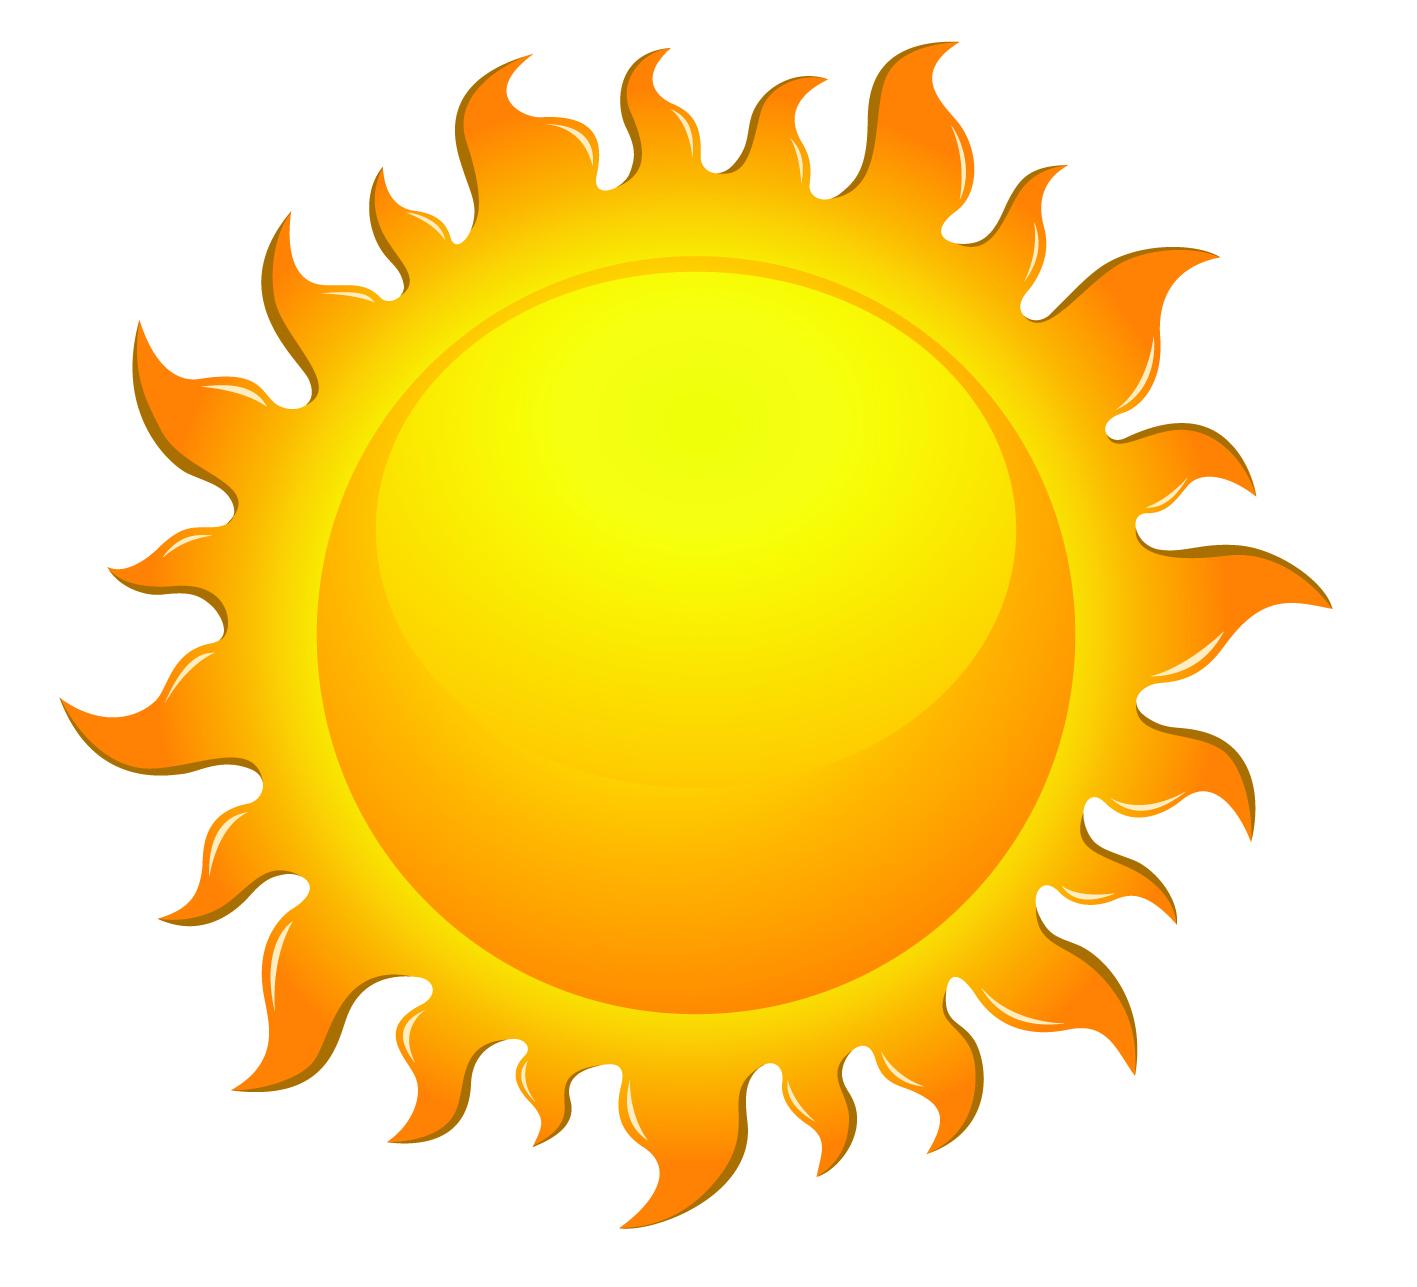 Free vector sun.